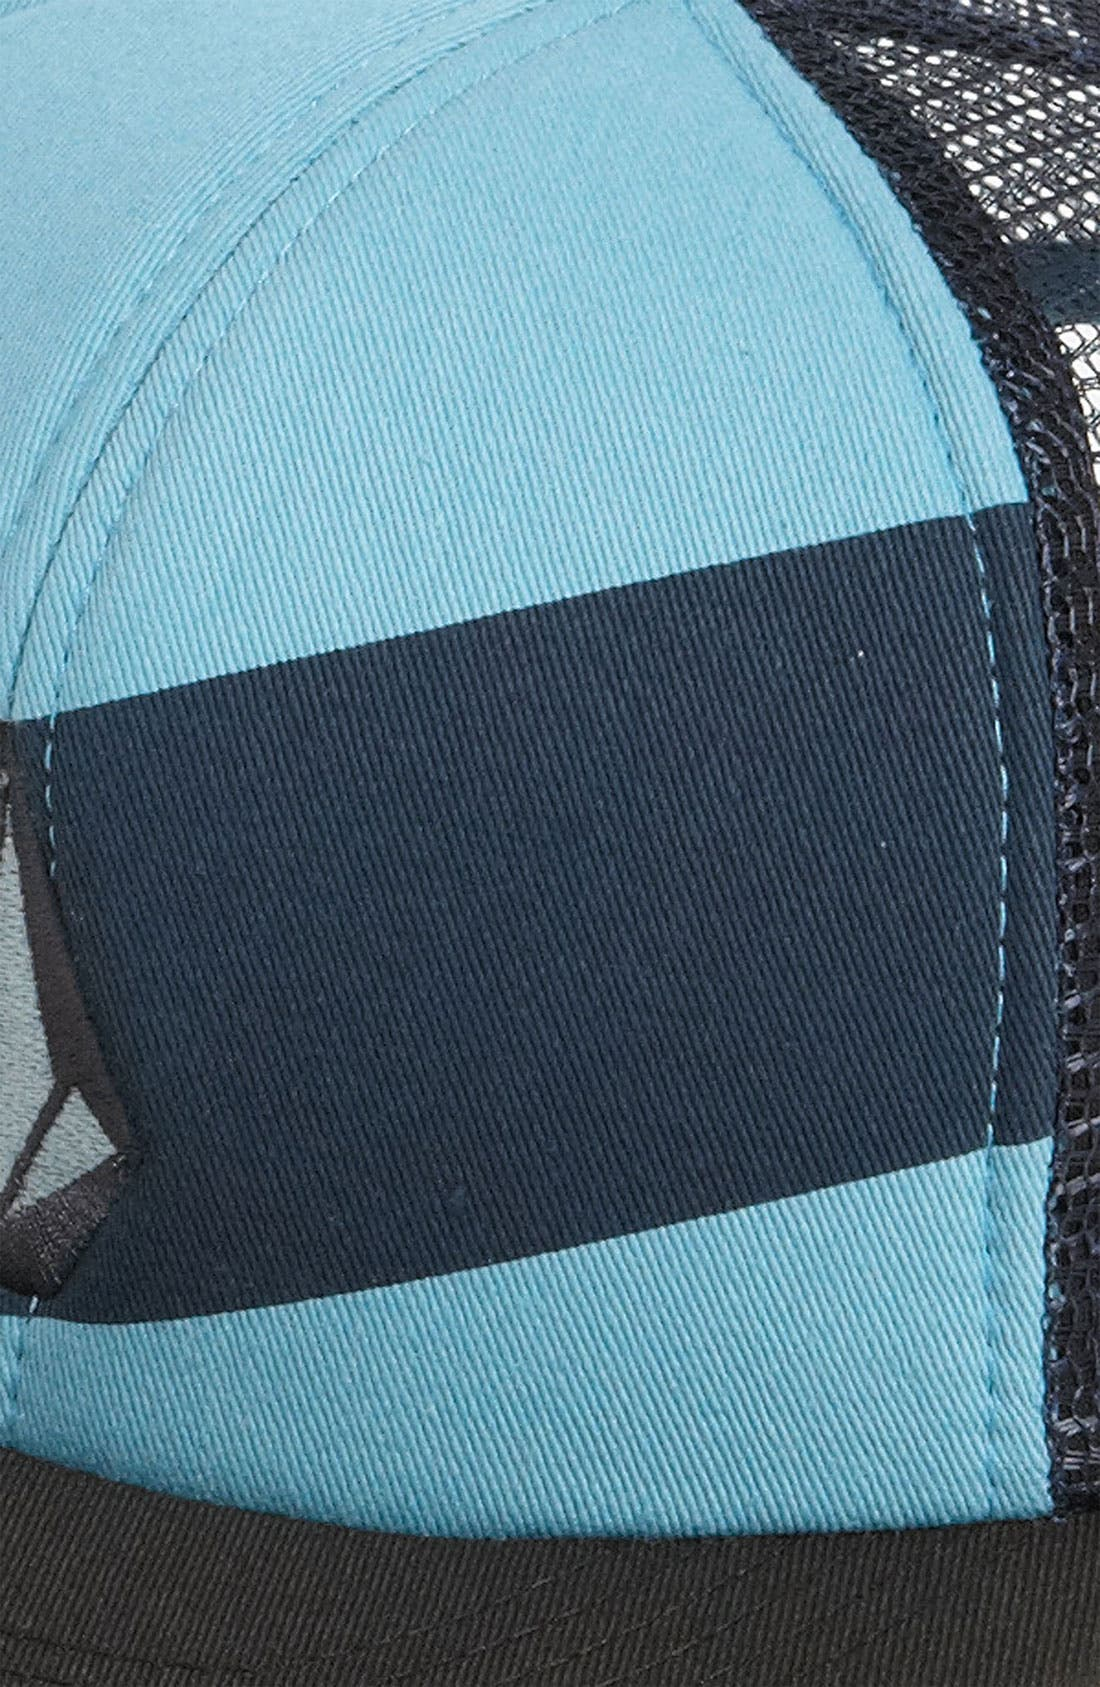 Alternate Image 2  - Volcom 'Fullstone' Trucker Hat (Big Boys)